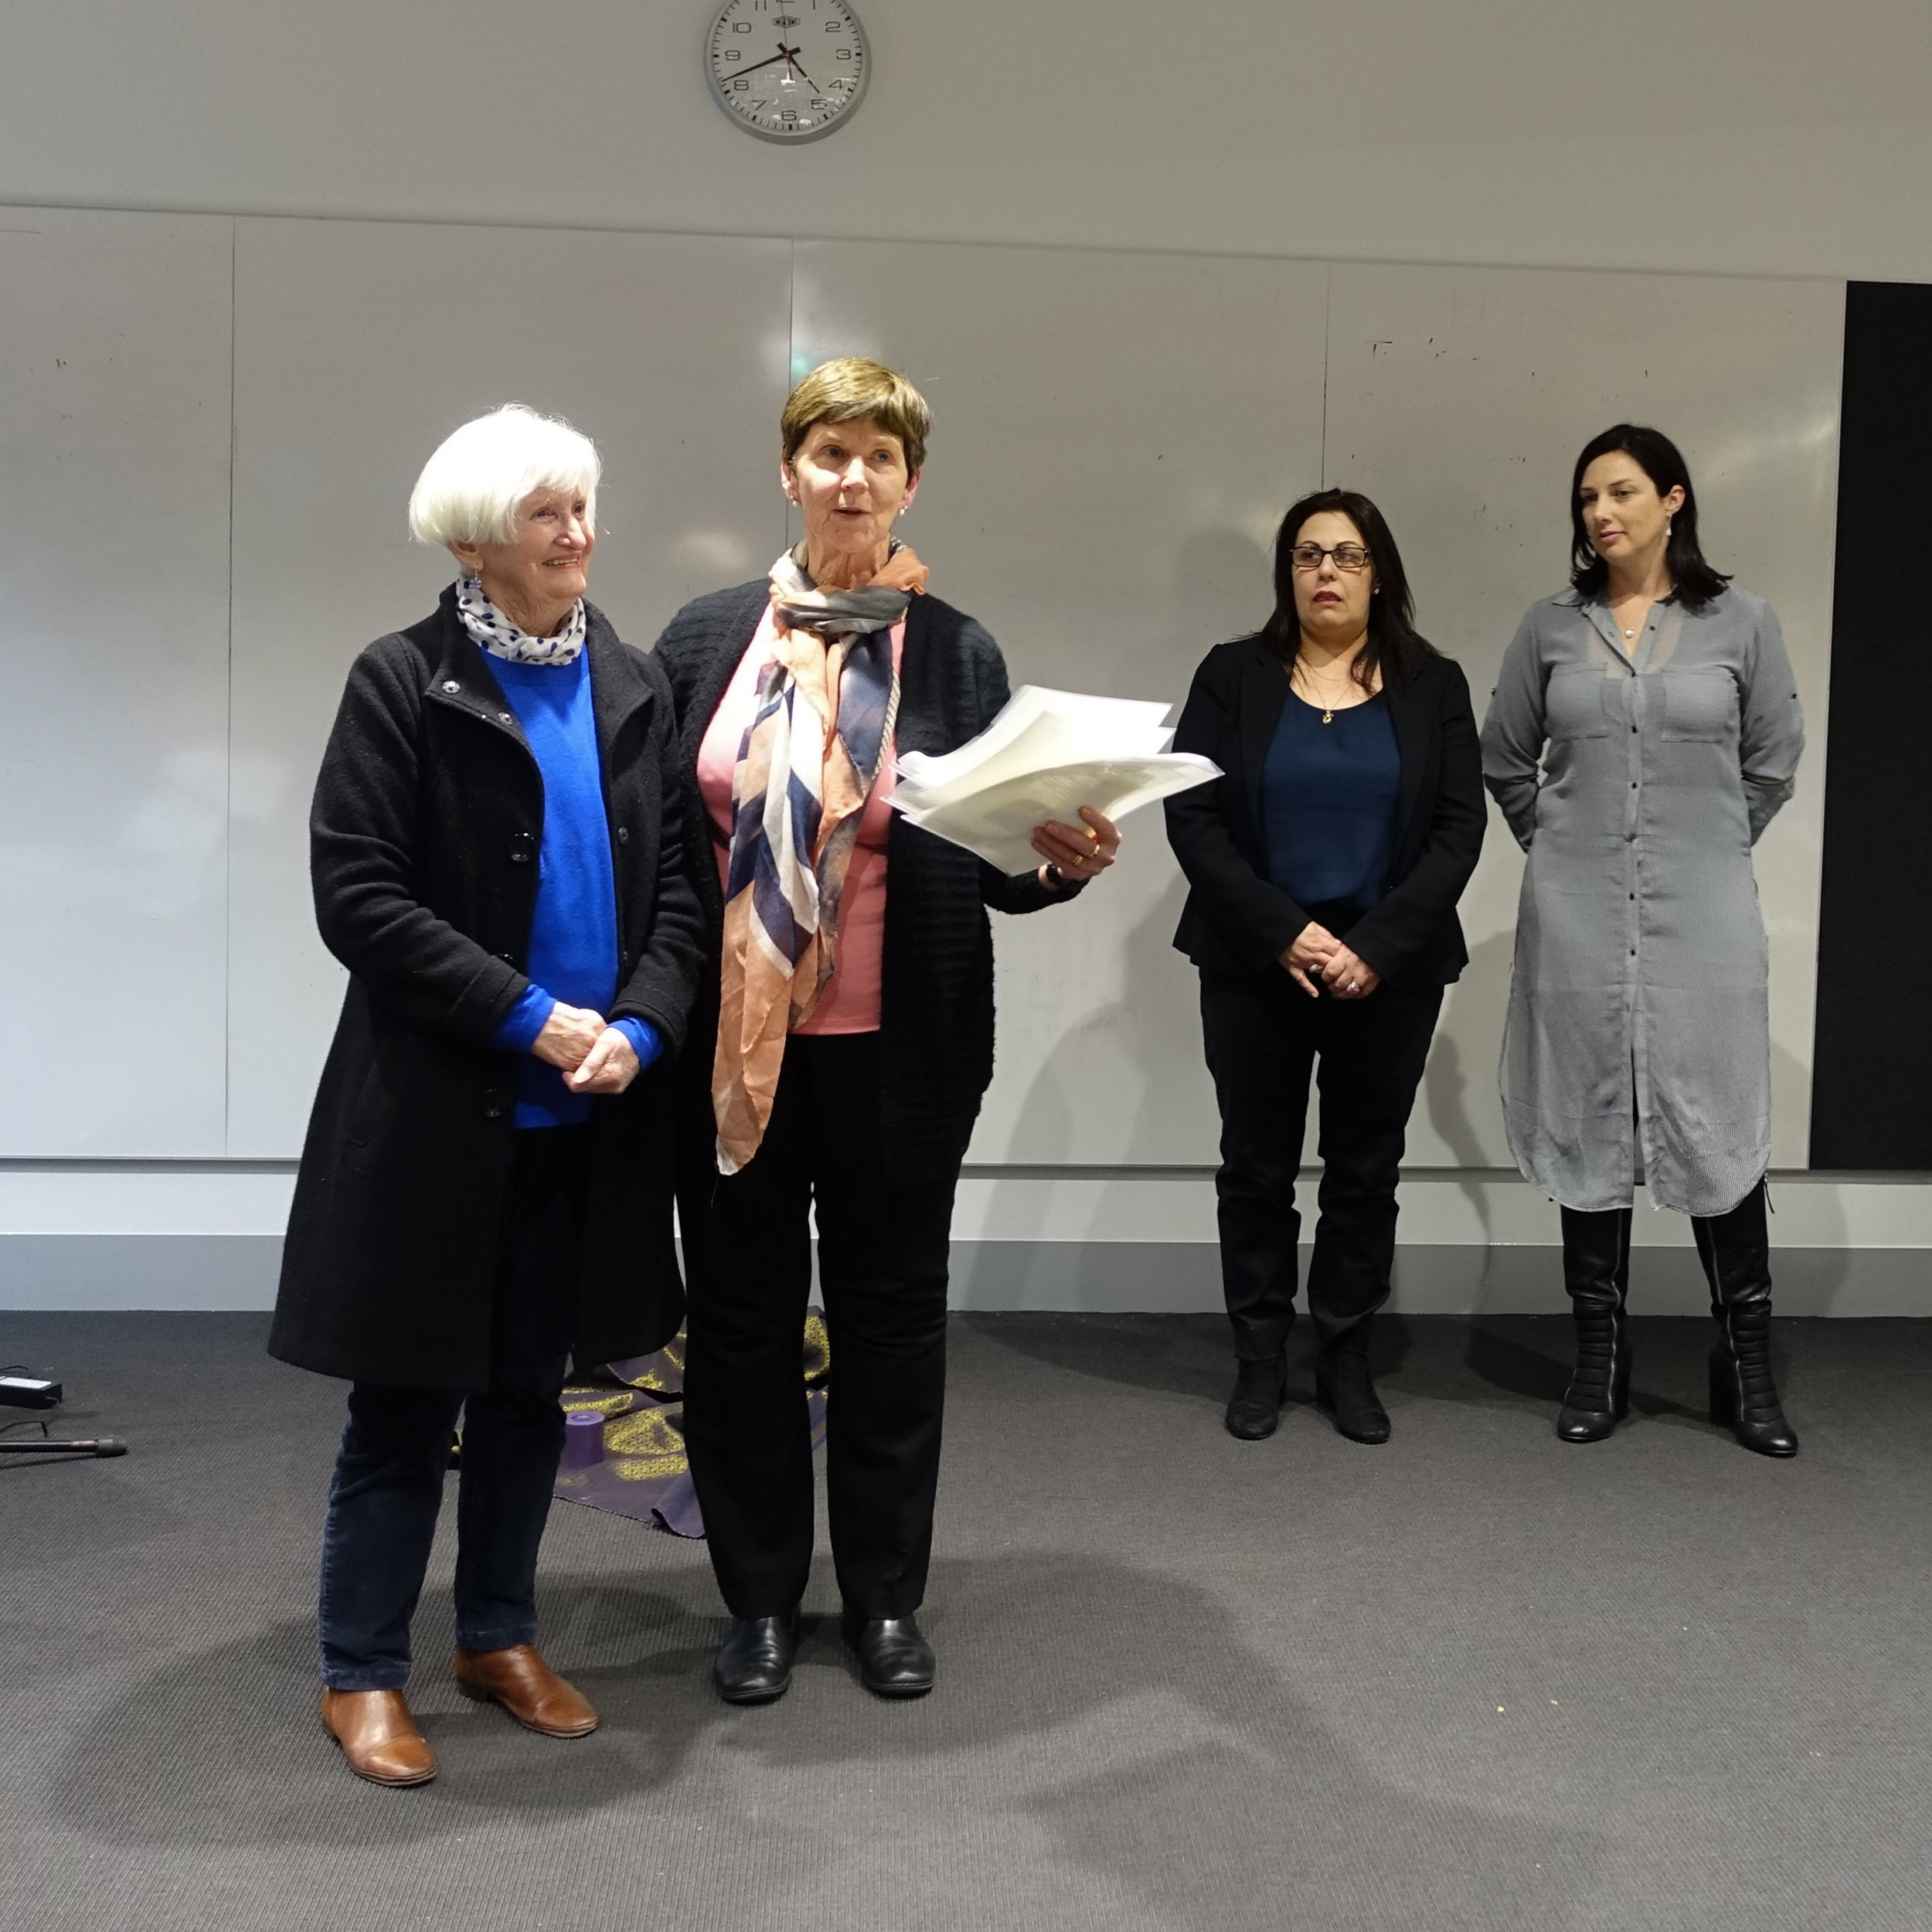 Melbourne Gathering Marcellin College-1-12.jpg